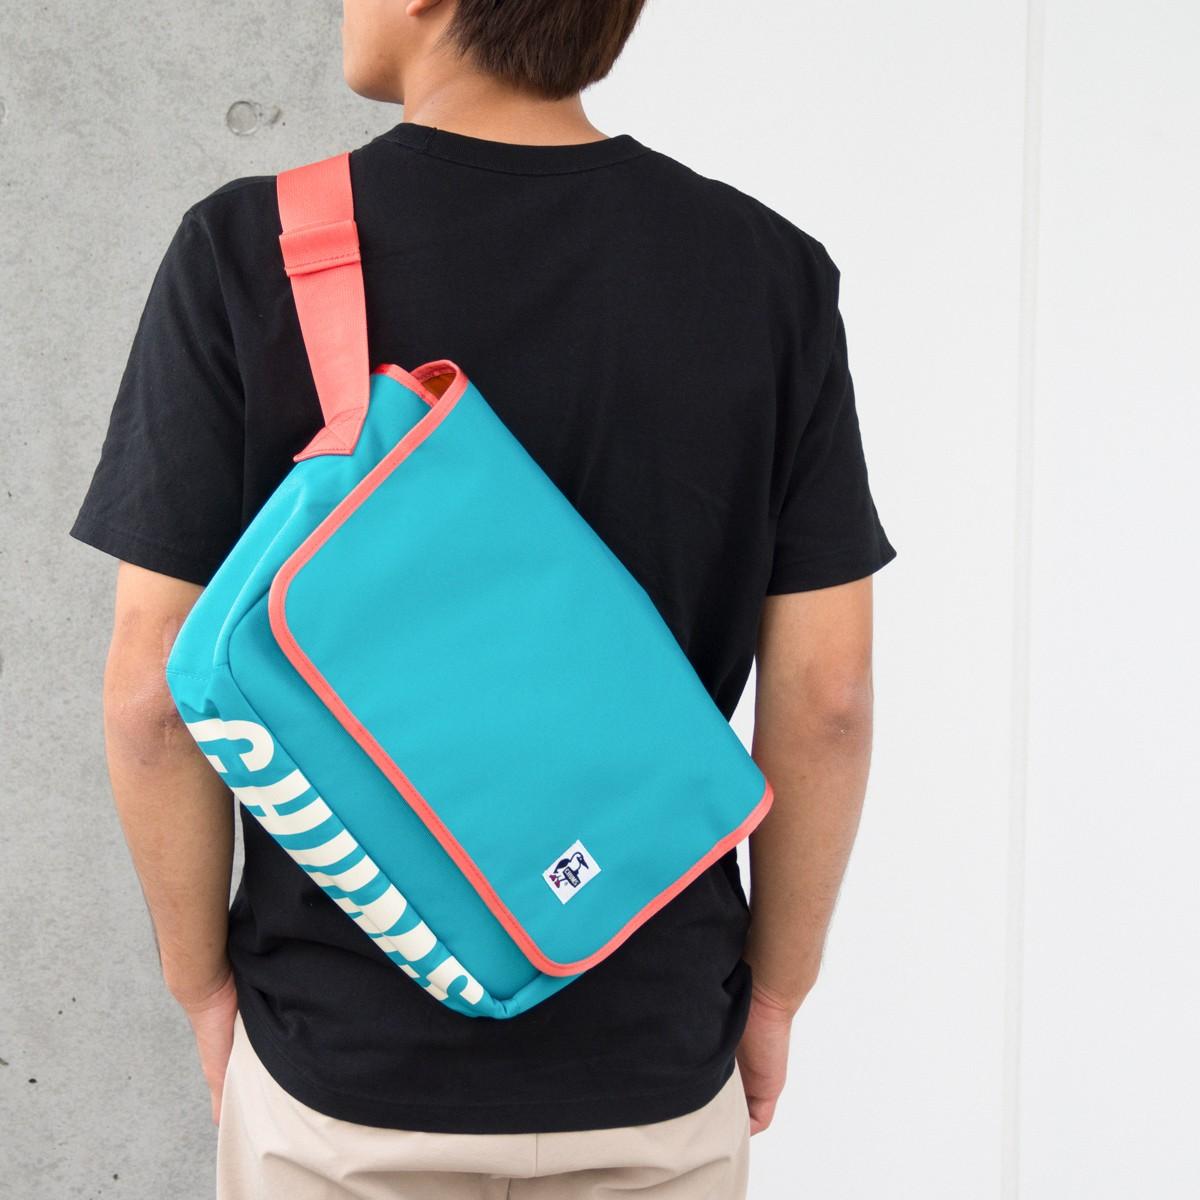 Eco CHUMS Messenger Bag エコ チャムス メッセンジャーバッグ